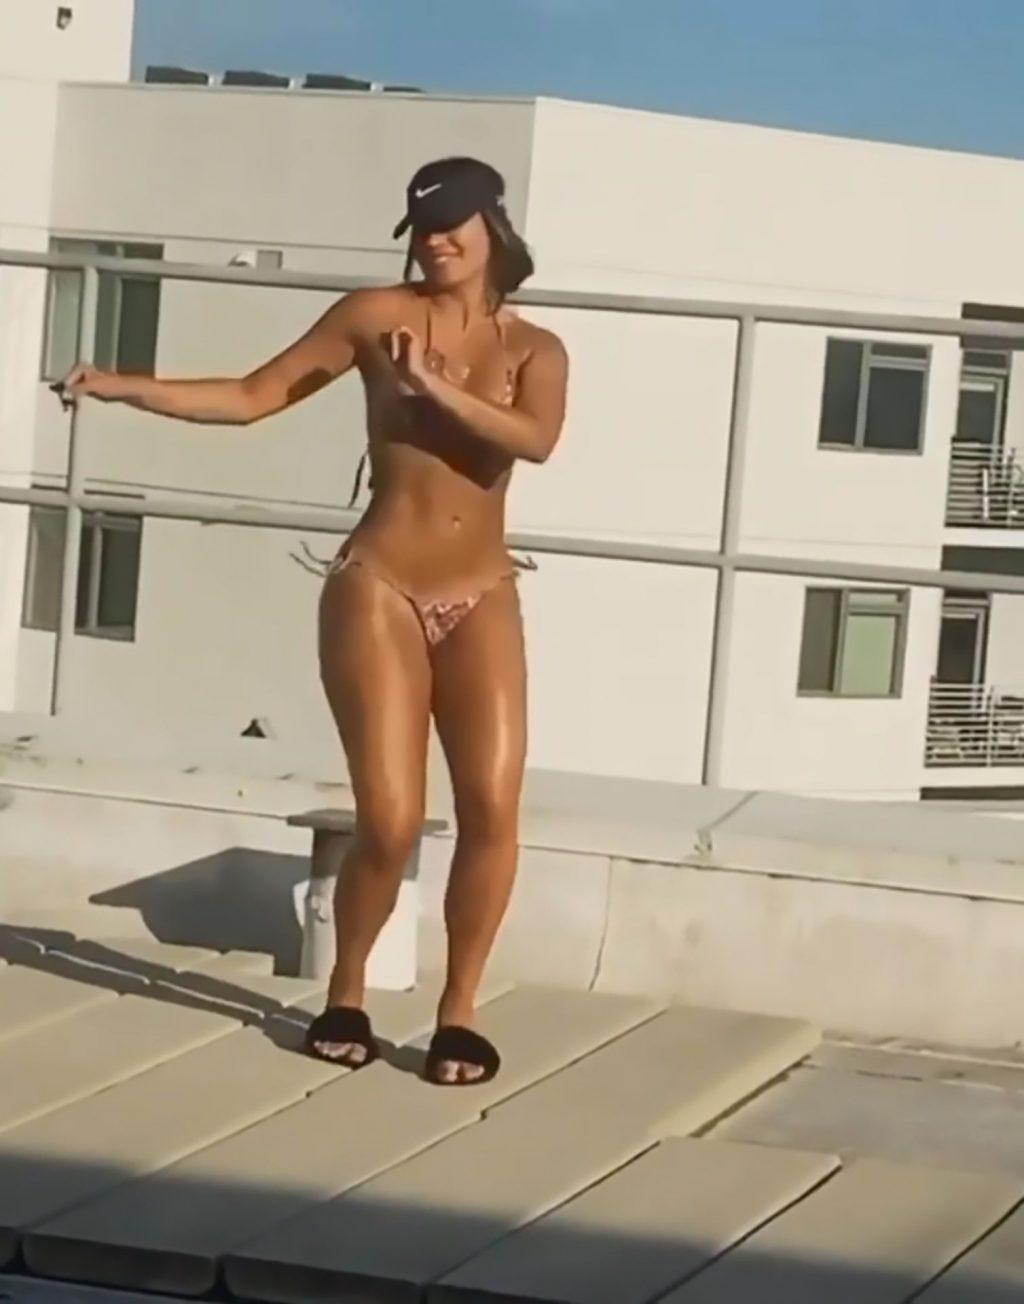 Lele Pons Dances Salsa on the Roof (12 Pics + Video)